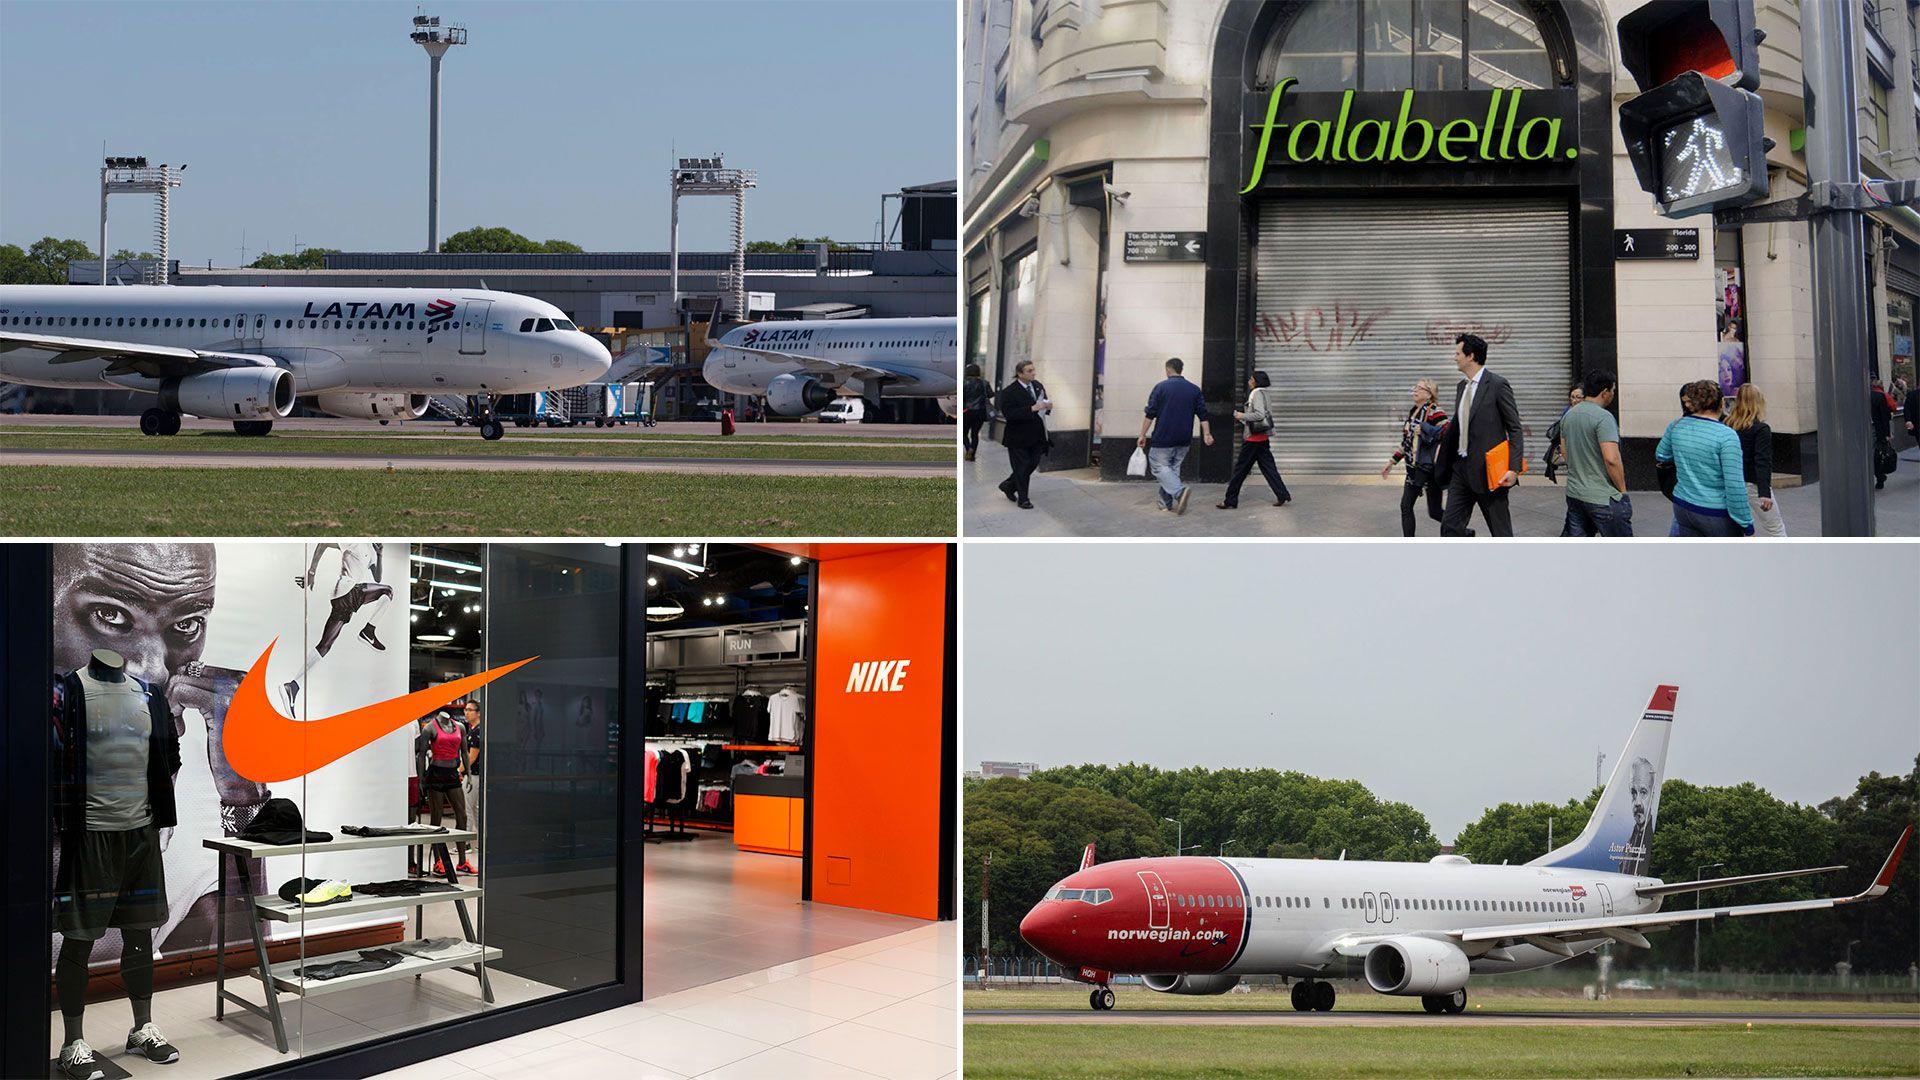 Latam, Falabella, Nike y Norwegian